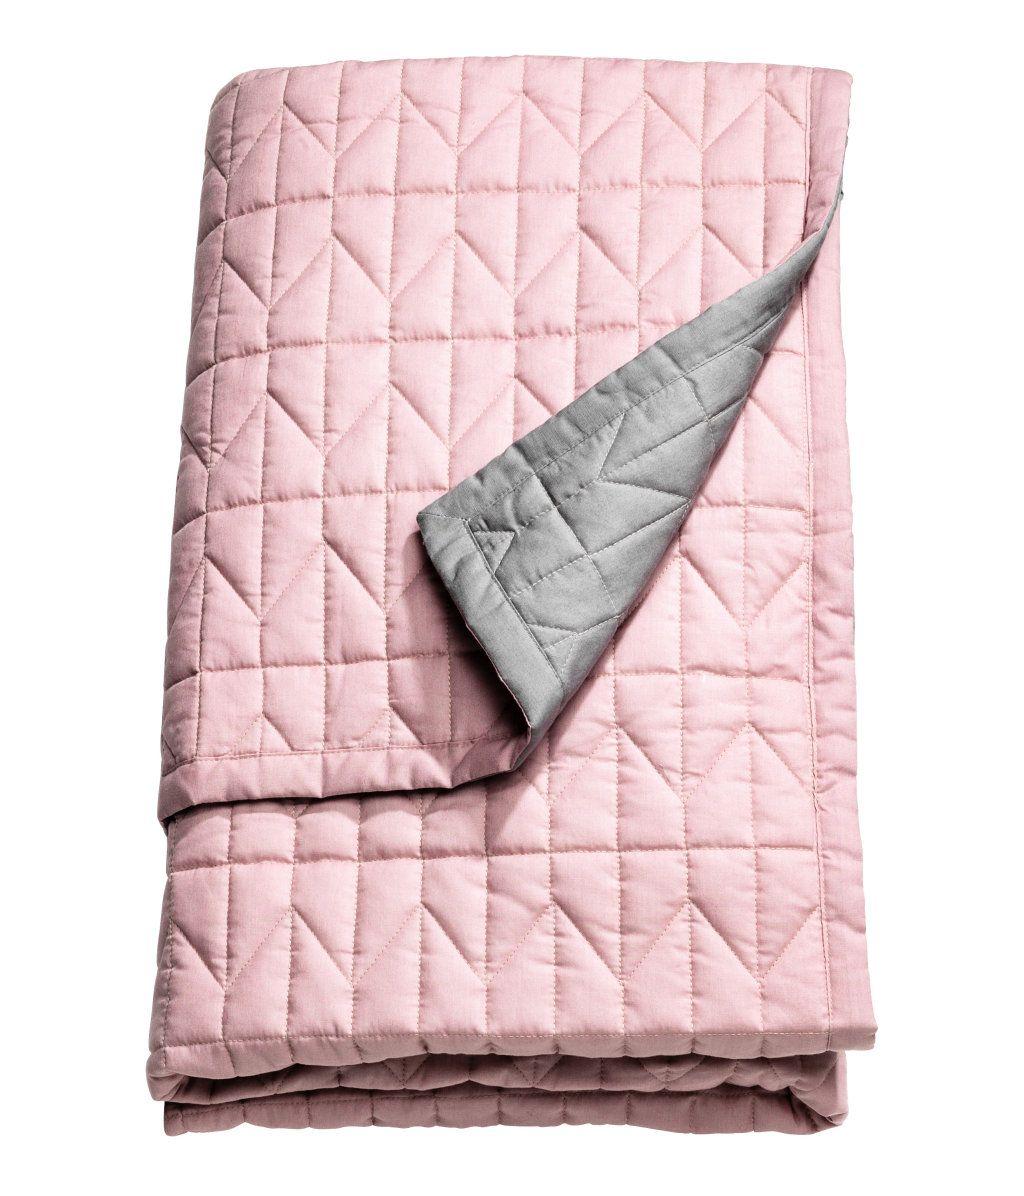 Rosa Grau Gesteppte Tagesdecke Aus Baumwolle Fur Ein Doppelbett Polyesterfullung Tagesdecke Rosa Tagesdecke Grau Bettwasche Pink